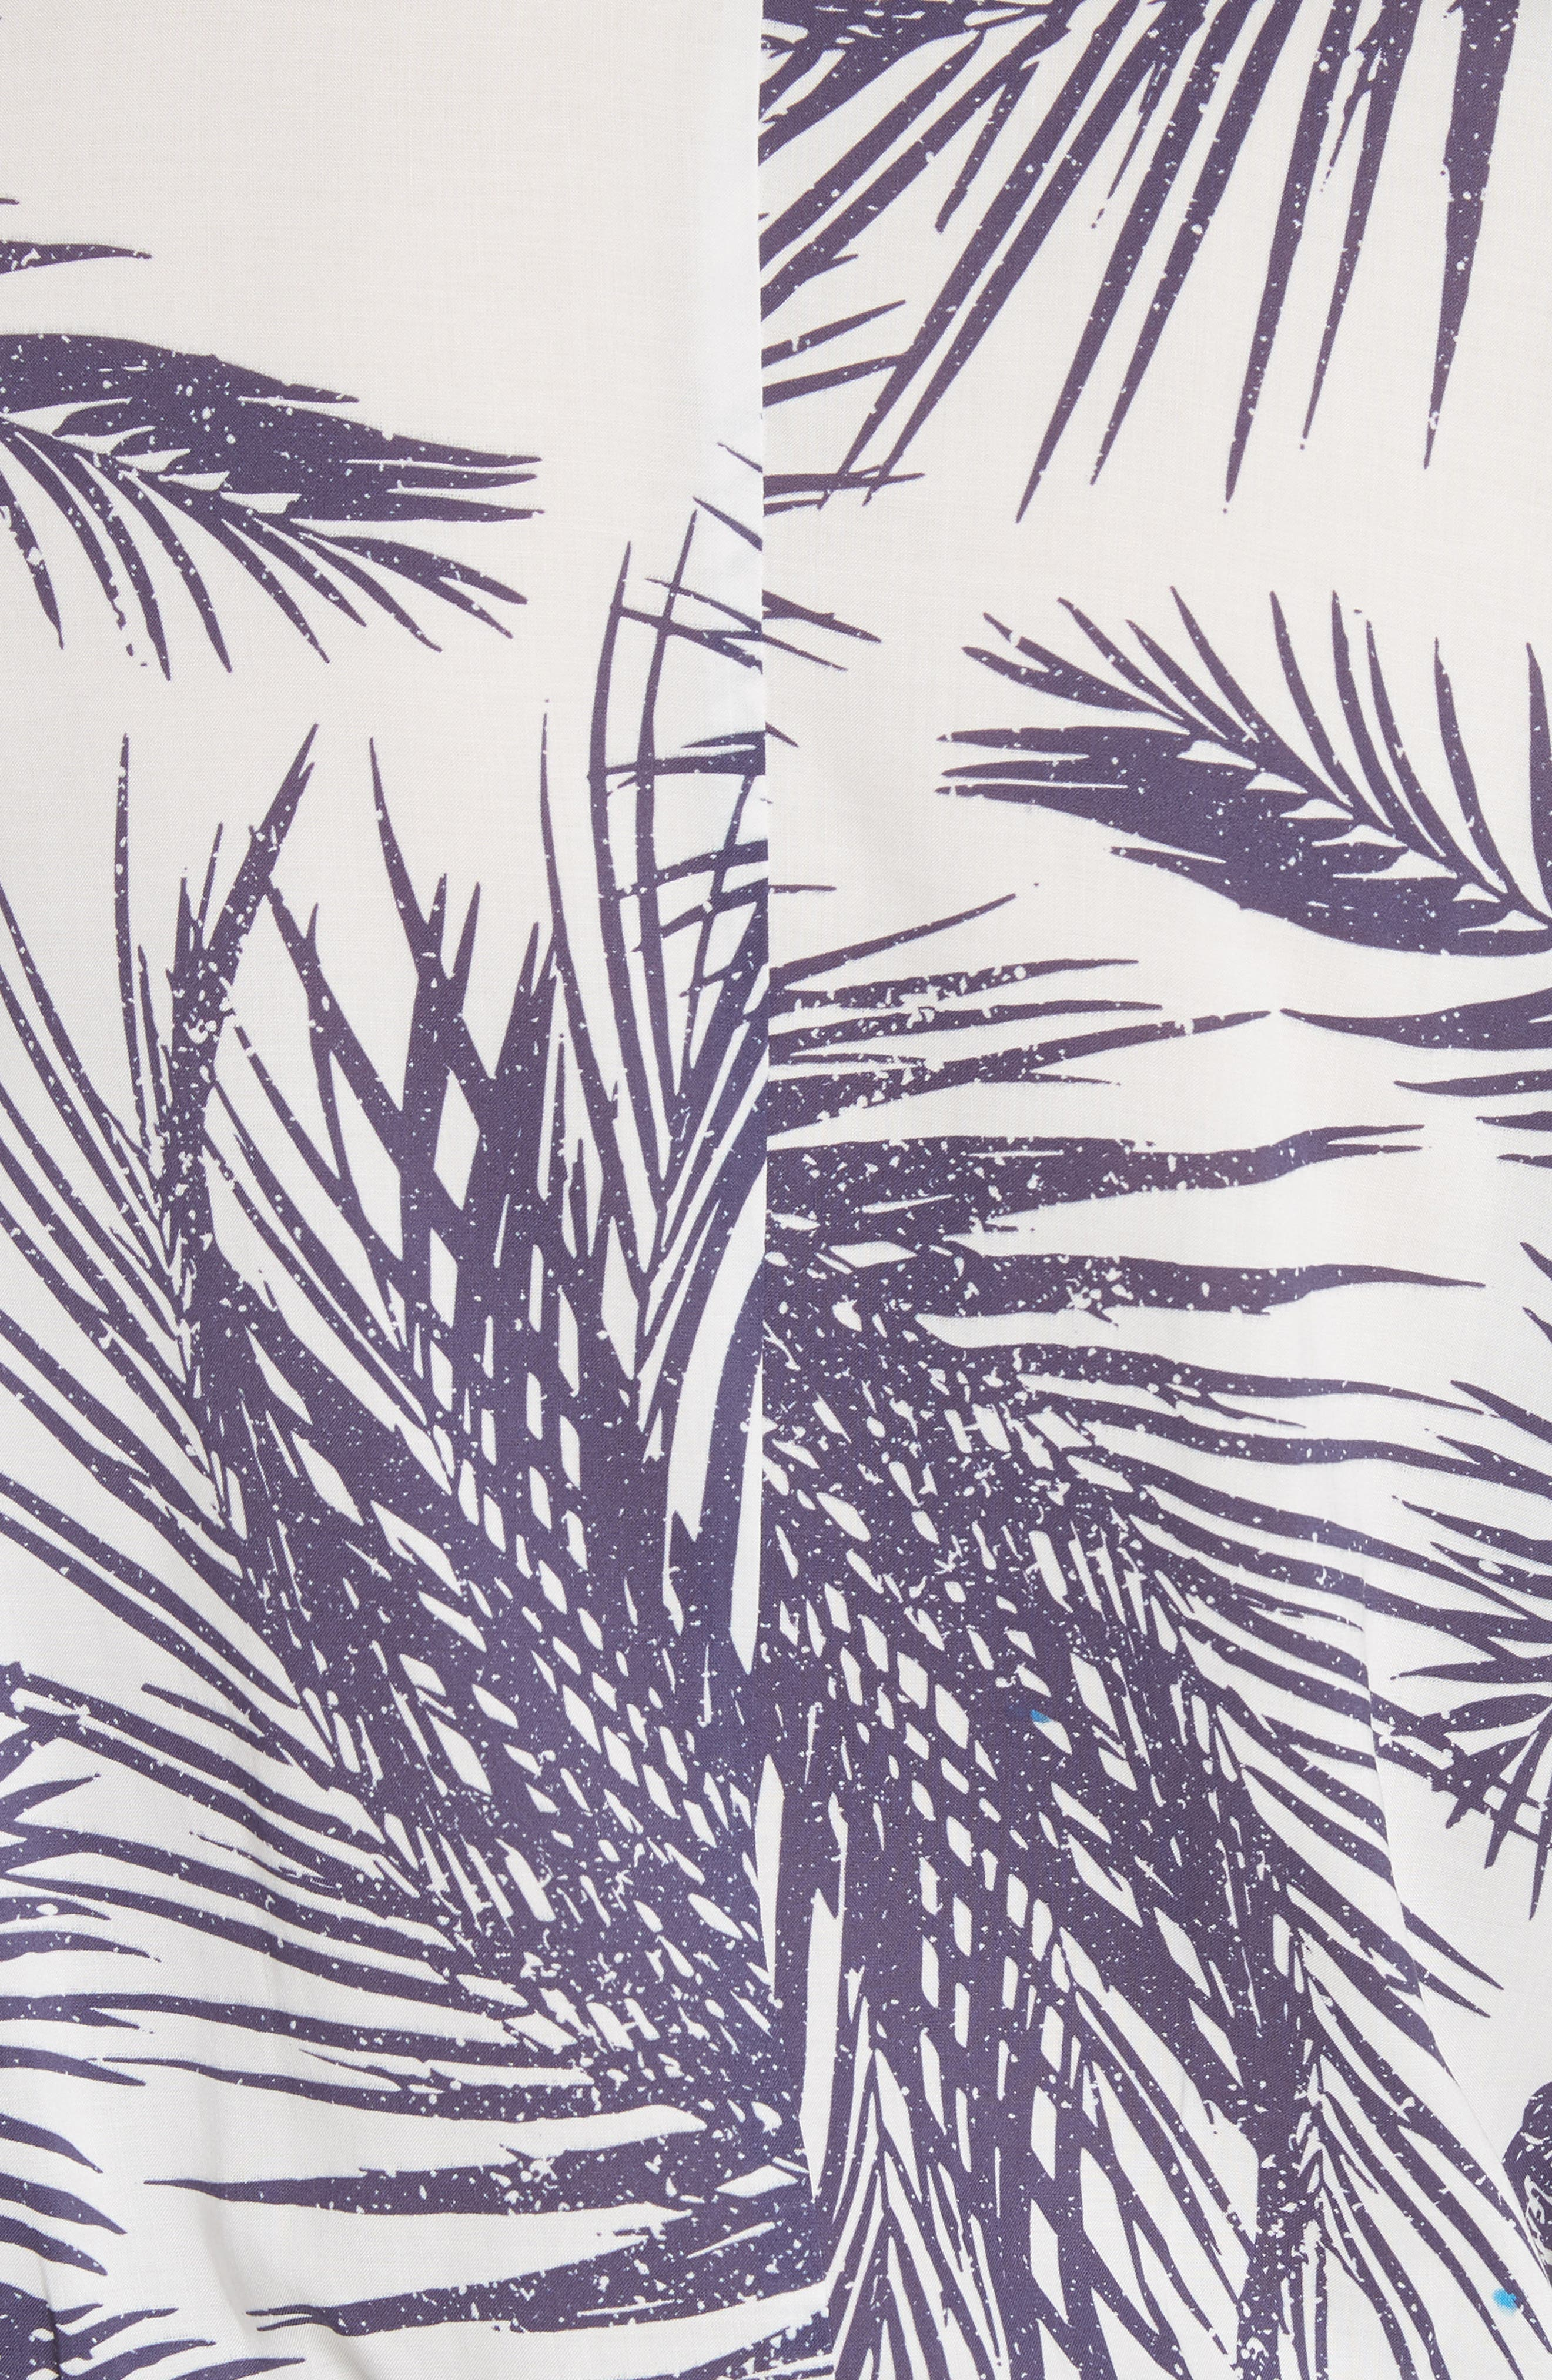 Apres Beach Print Jumpsuit,                             Alternate thumbnail 5, color,                             White/ Dark Purple